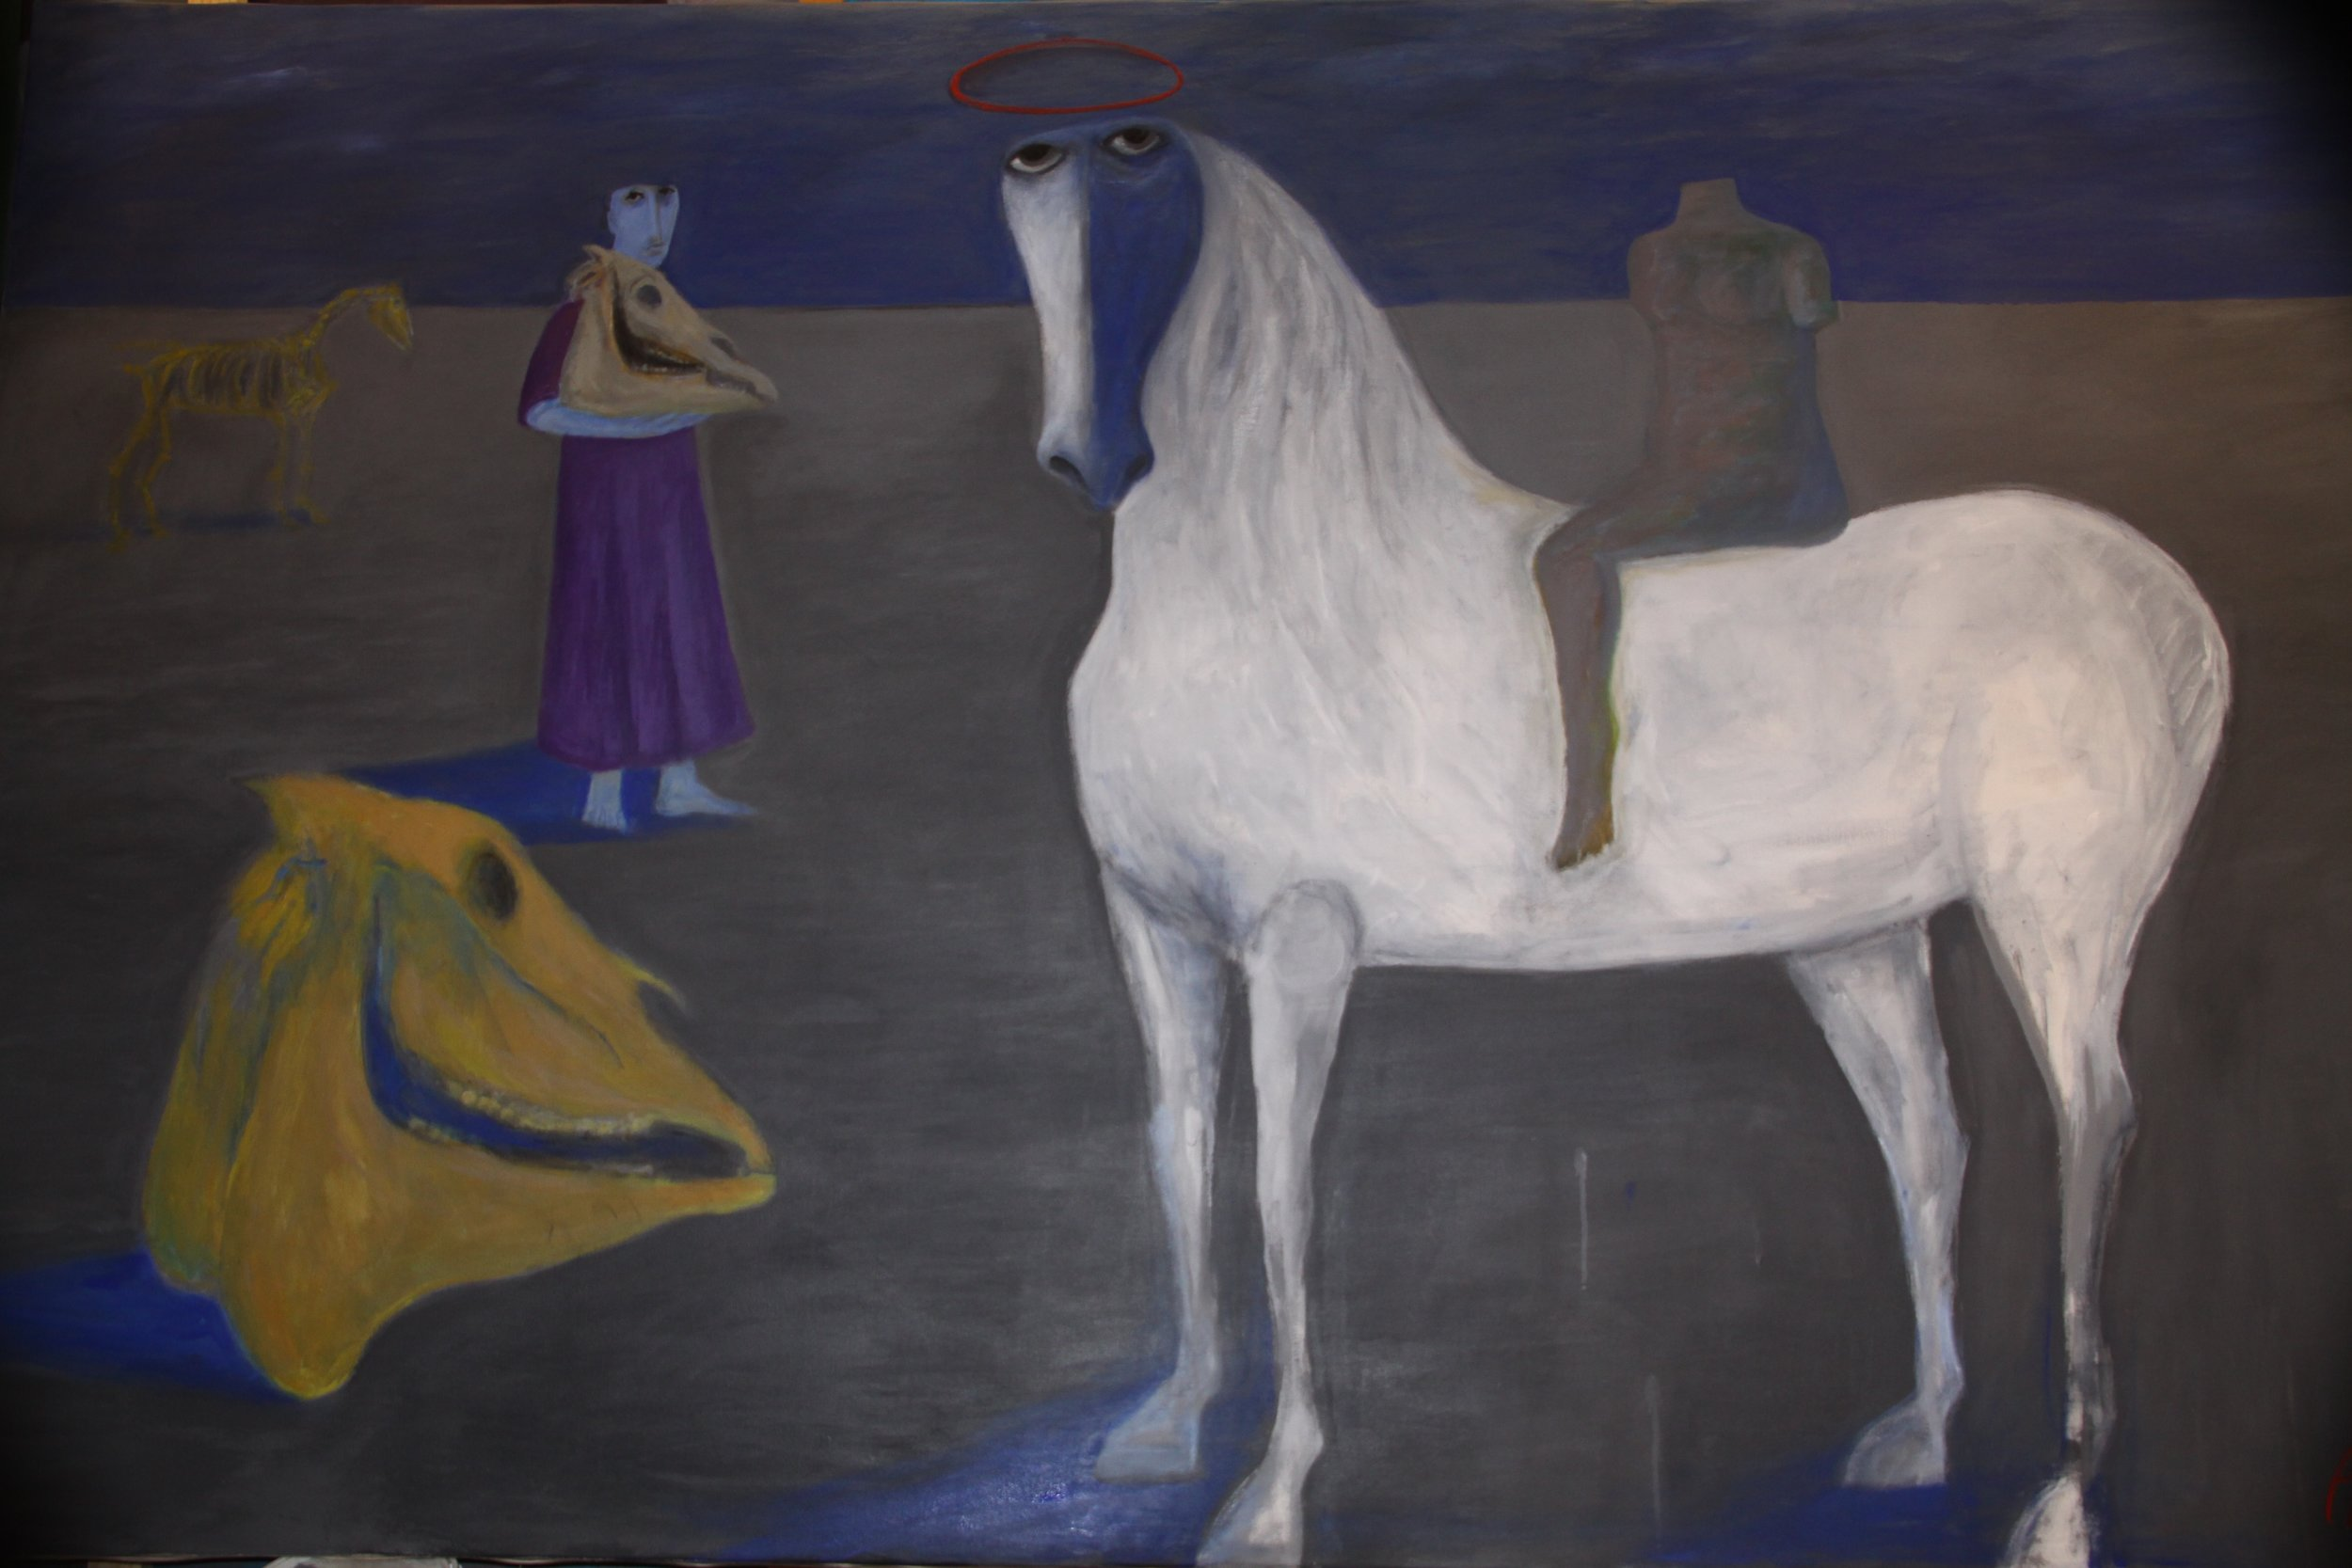 Ahmed_Morsi_The_White_Horse_2014 copy.jpg